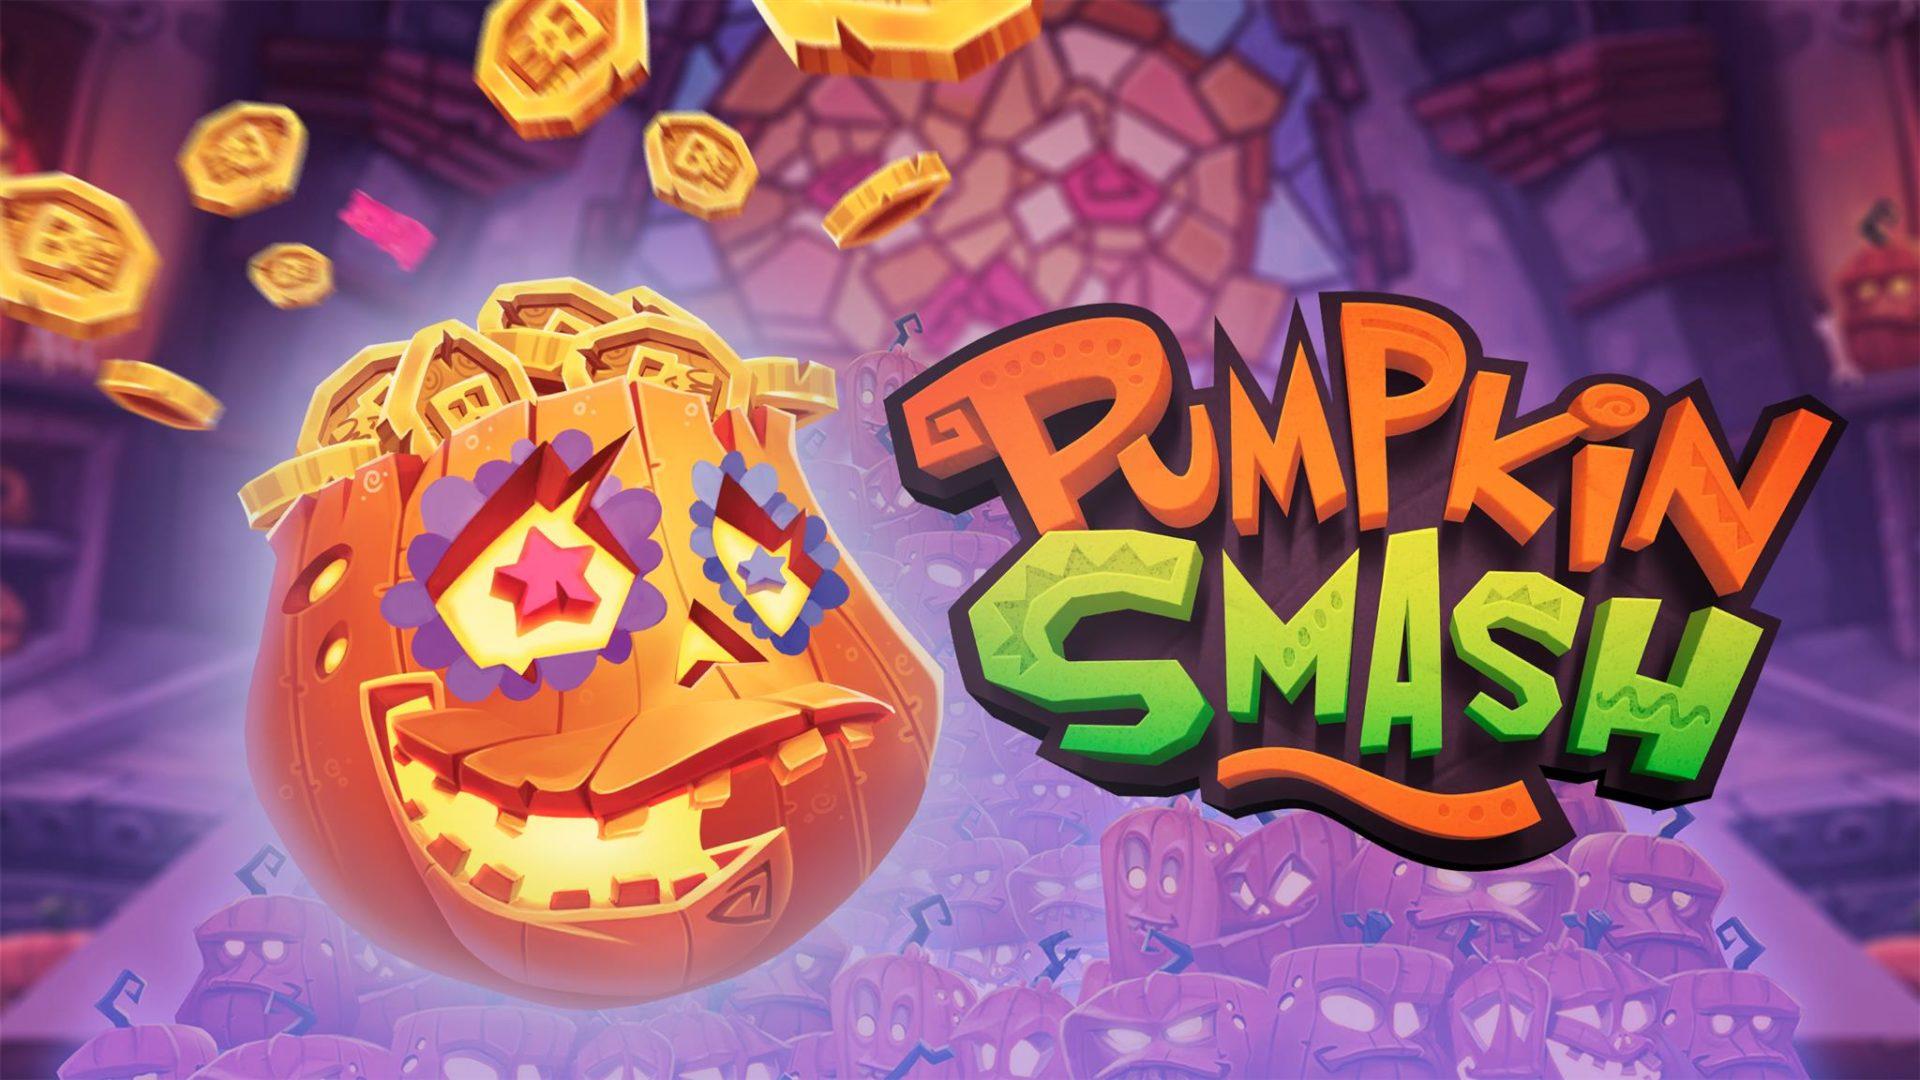 http://playfortuna-2019.pro/wp-content/uploads/2017/12/pumpkin-smash-slots-150x150.jpg